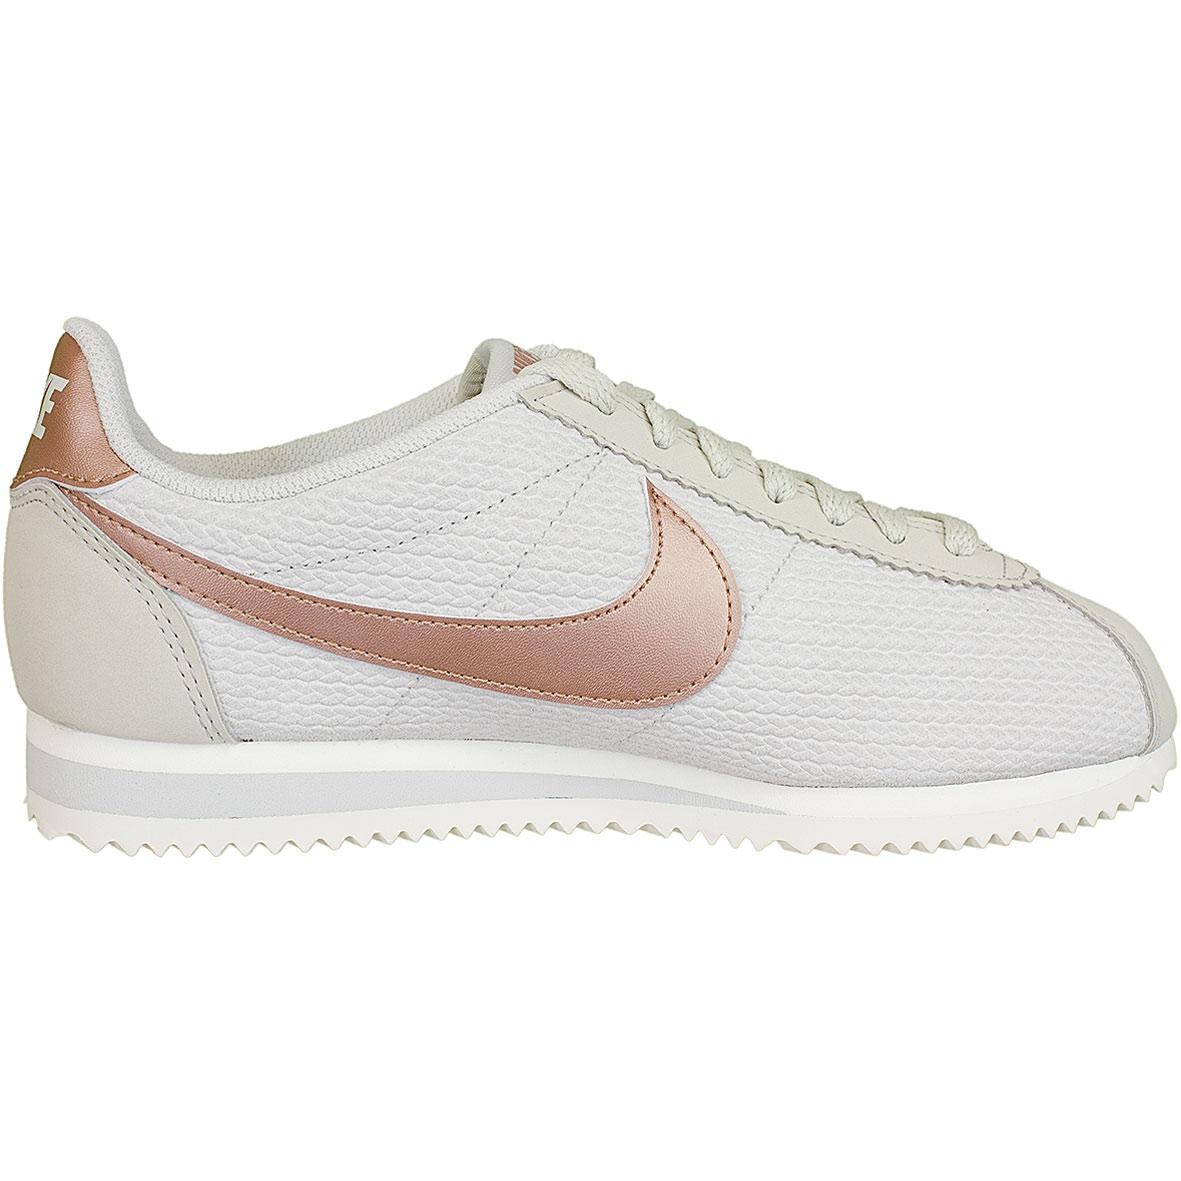 the best attitude 58a55 efcd0 Nike Damen Sneaker Classic Cortez Leather Lux beigebronze